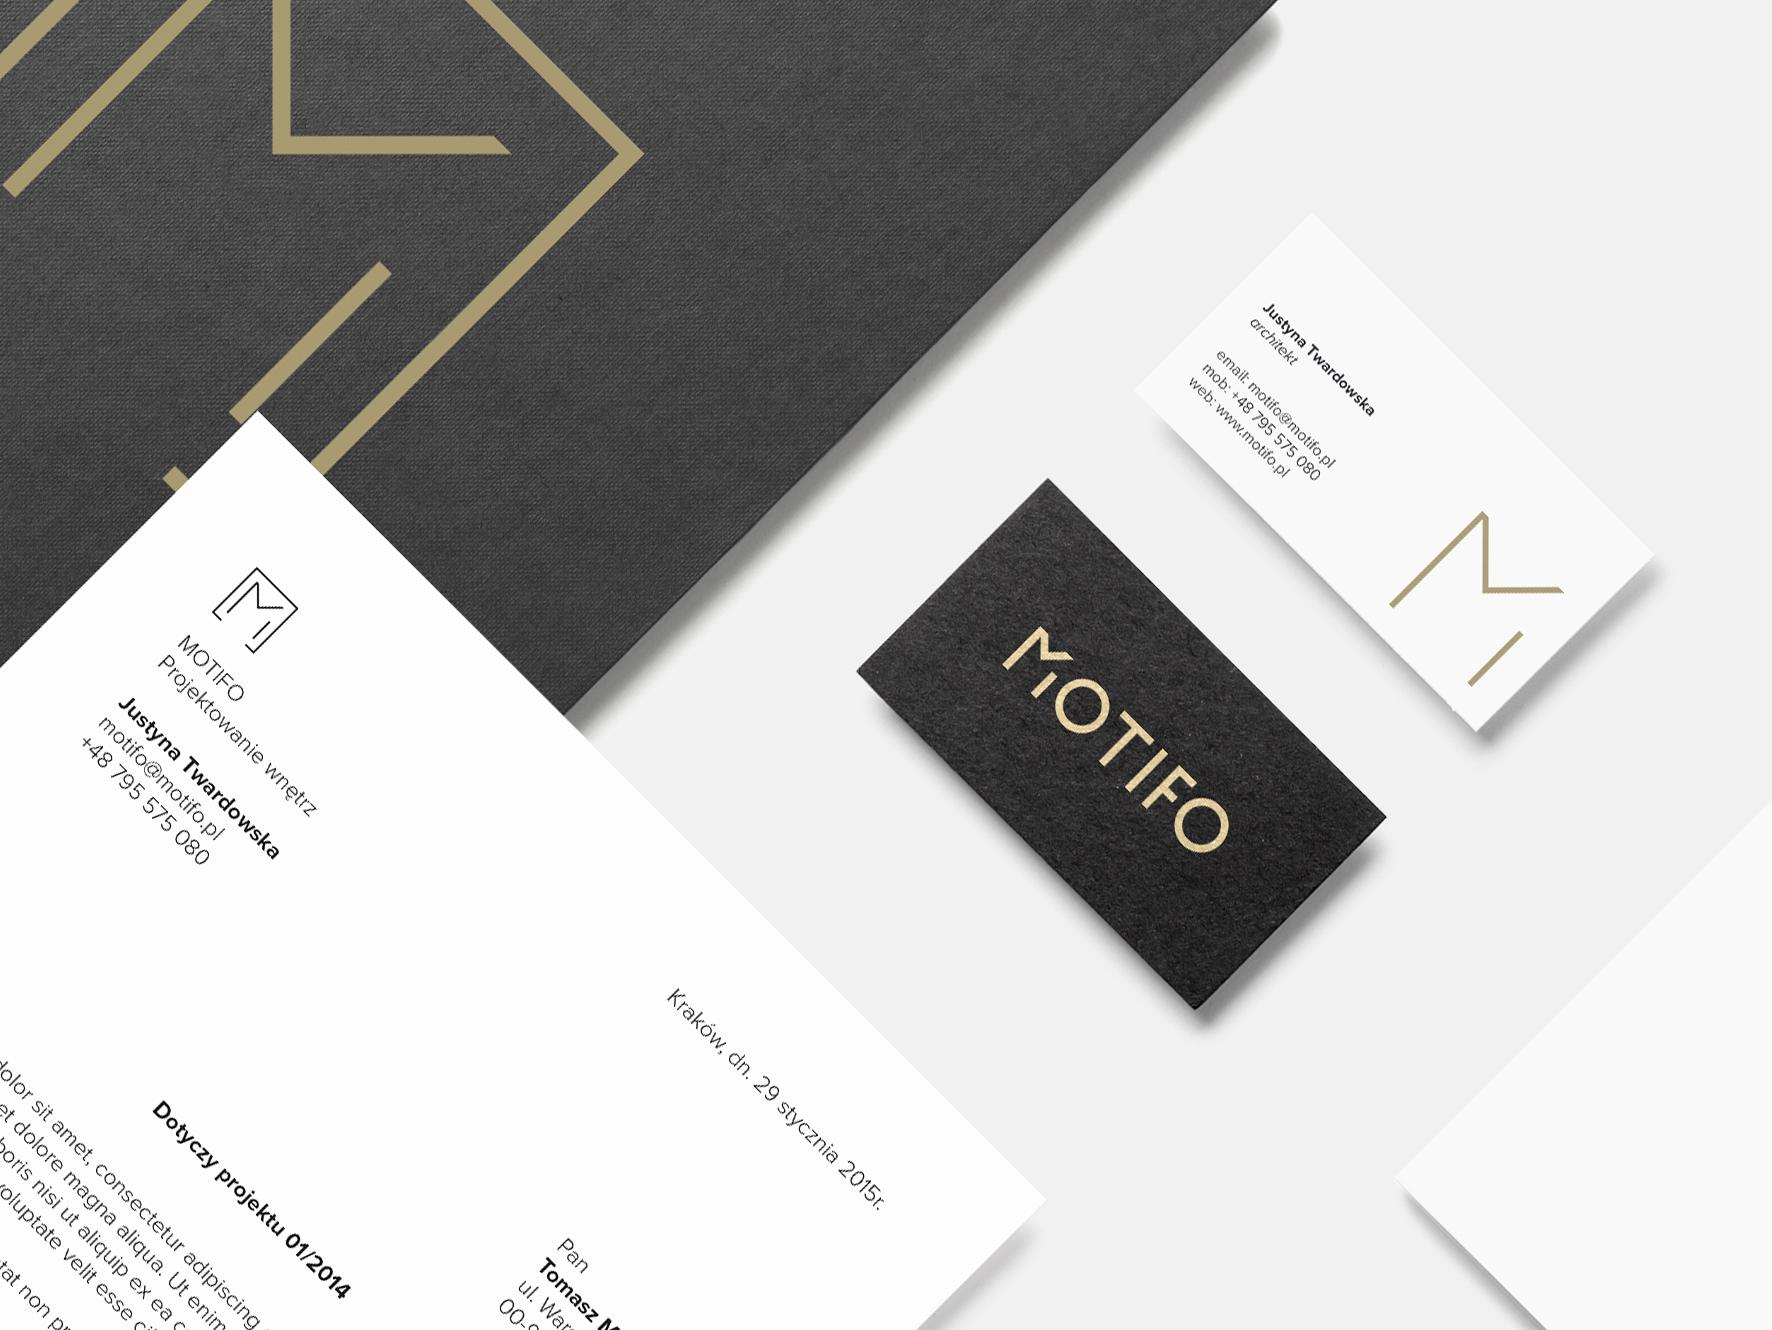 Interior Design Branding Pleasing Motifo  Interior Design Architect  Branding & Website On Behance Design Inspiration